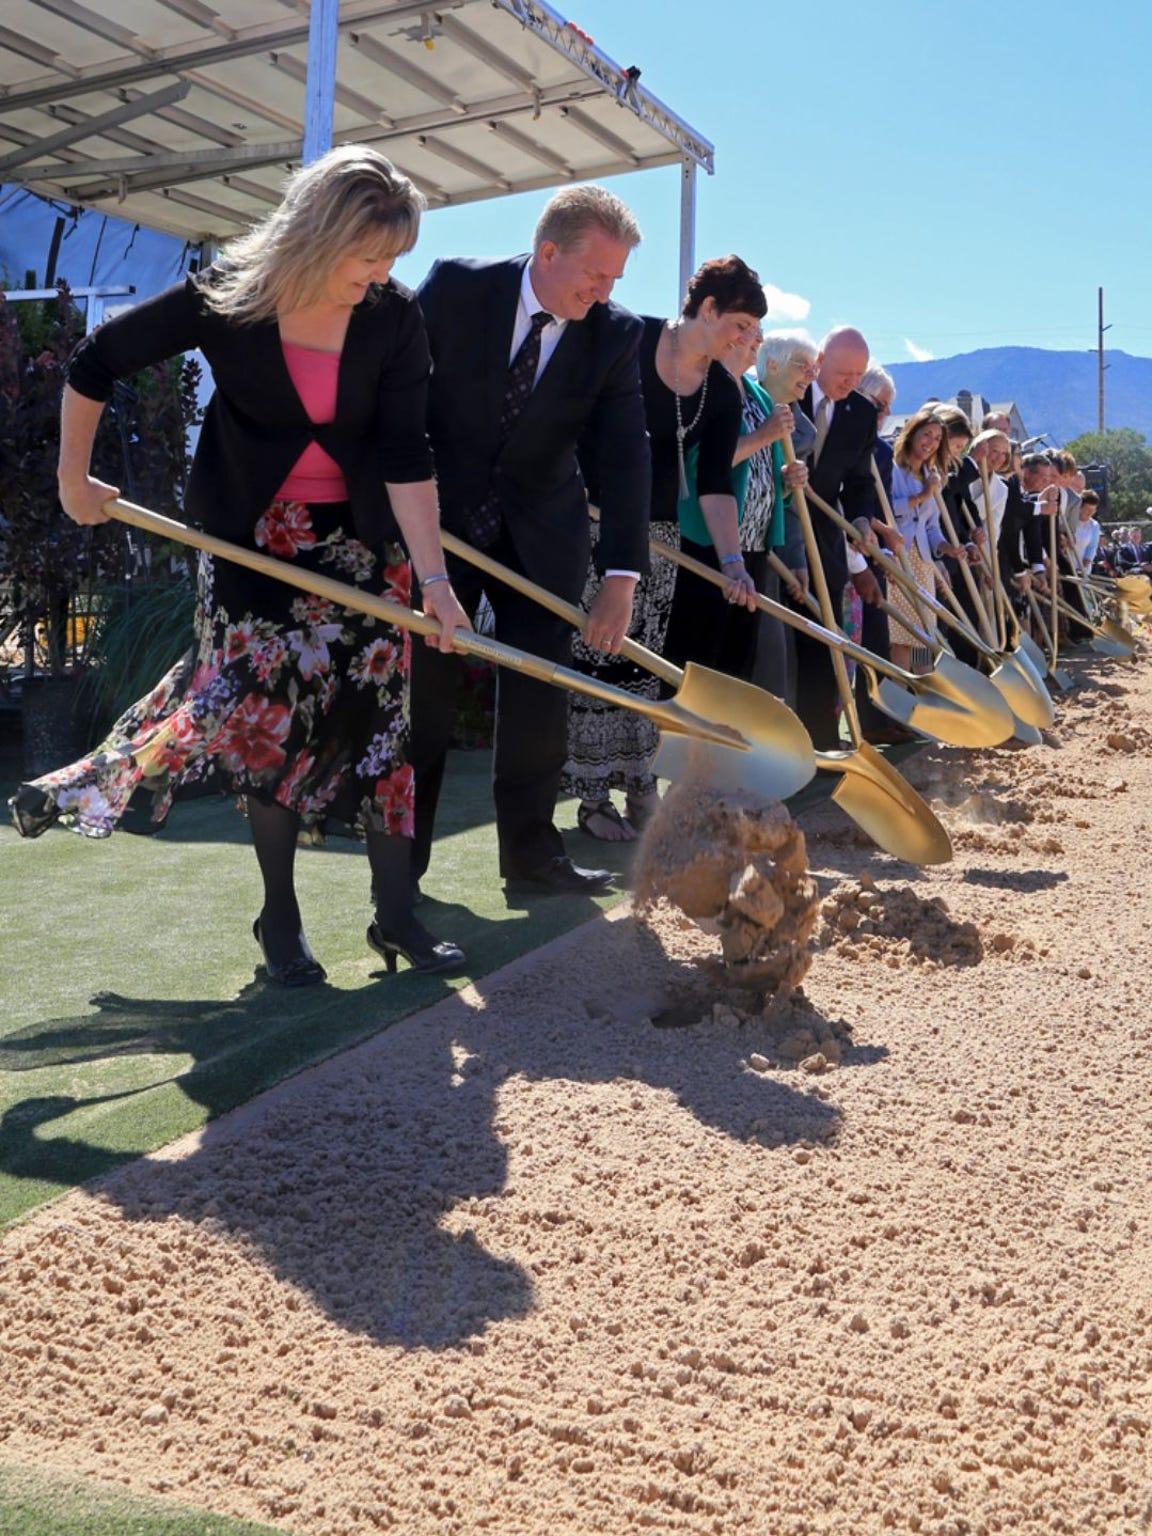 Groundbreaking ceremony for the LDS Cedar City Utah Temple.